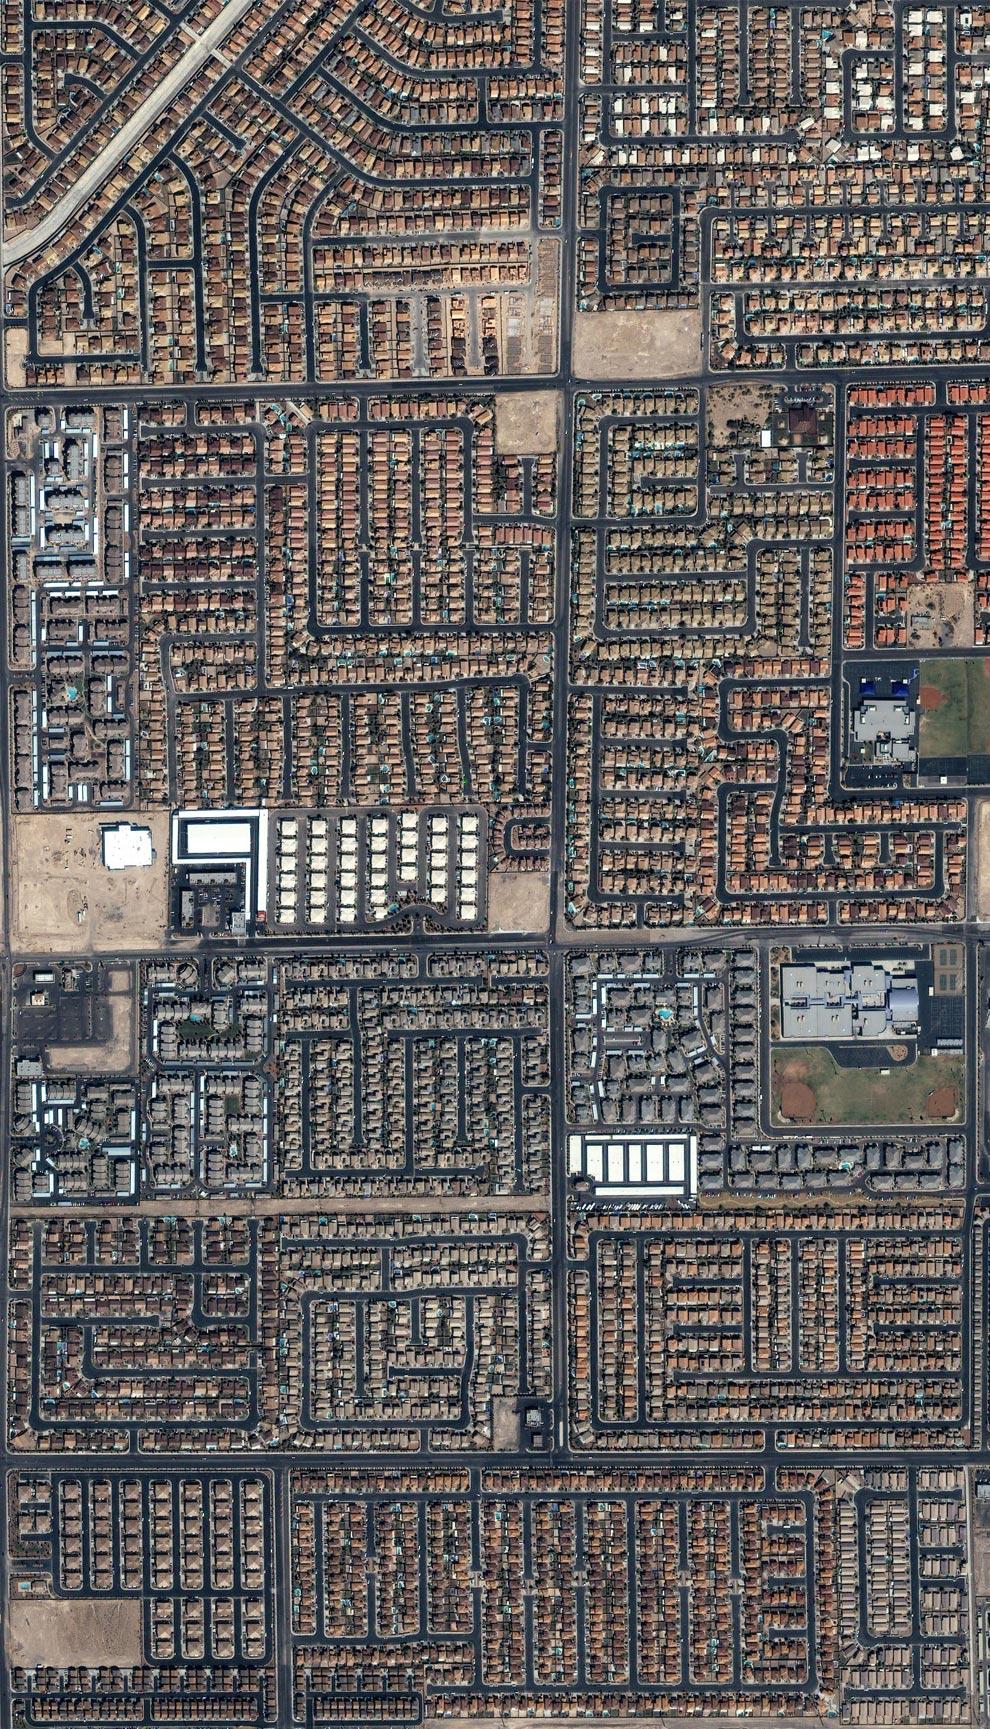 IKONOS satellite image ©2004 GeoEye